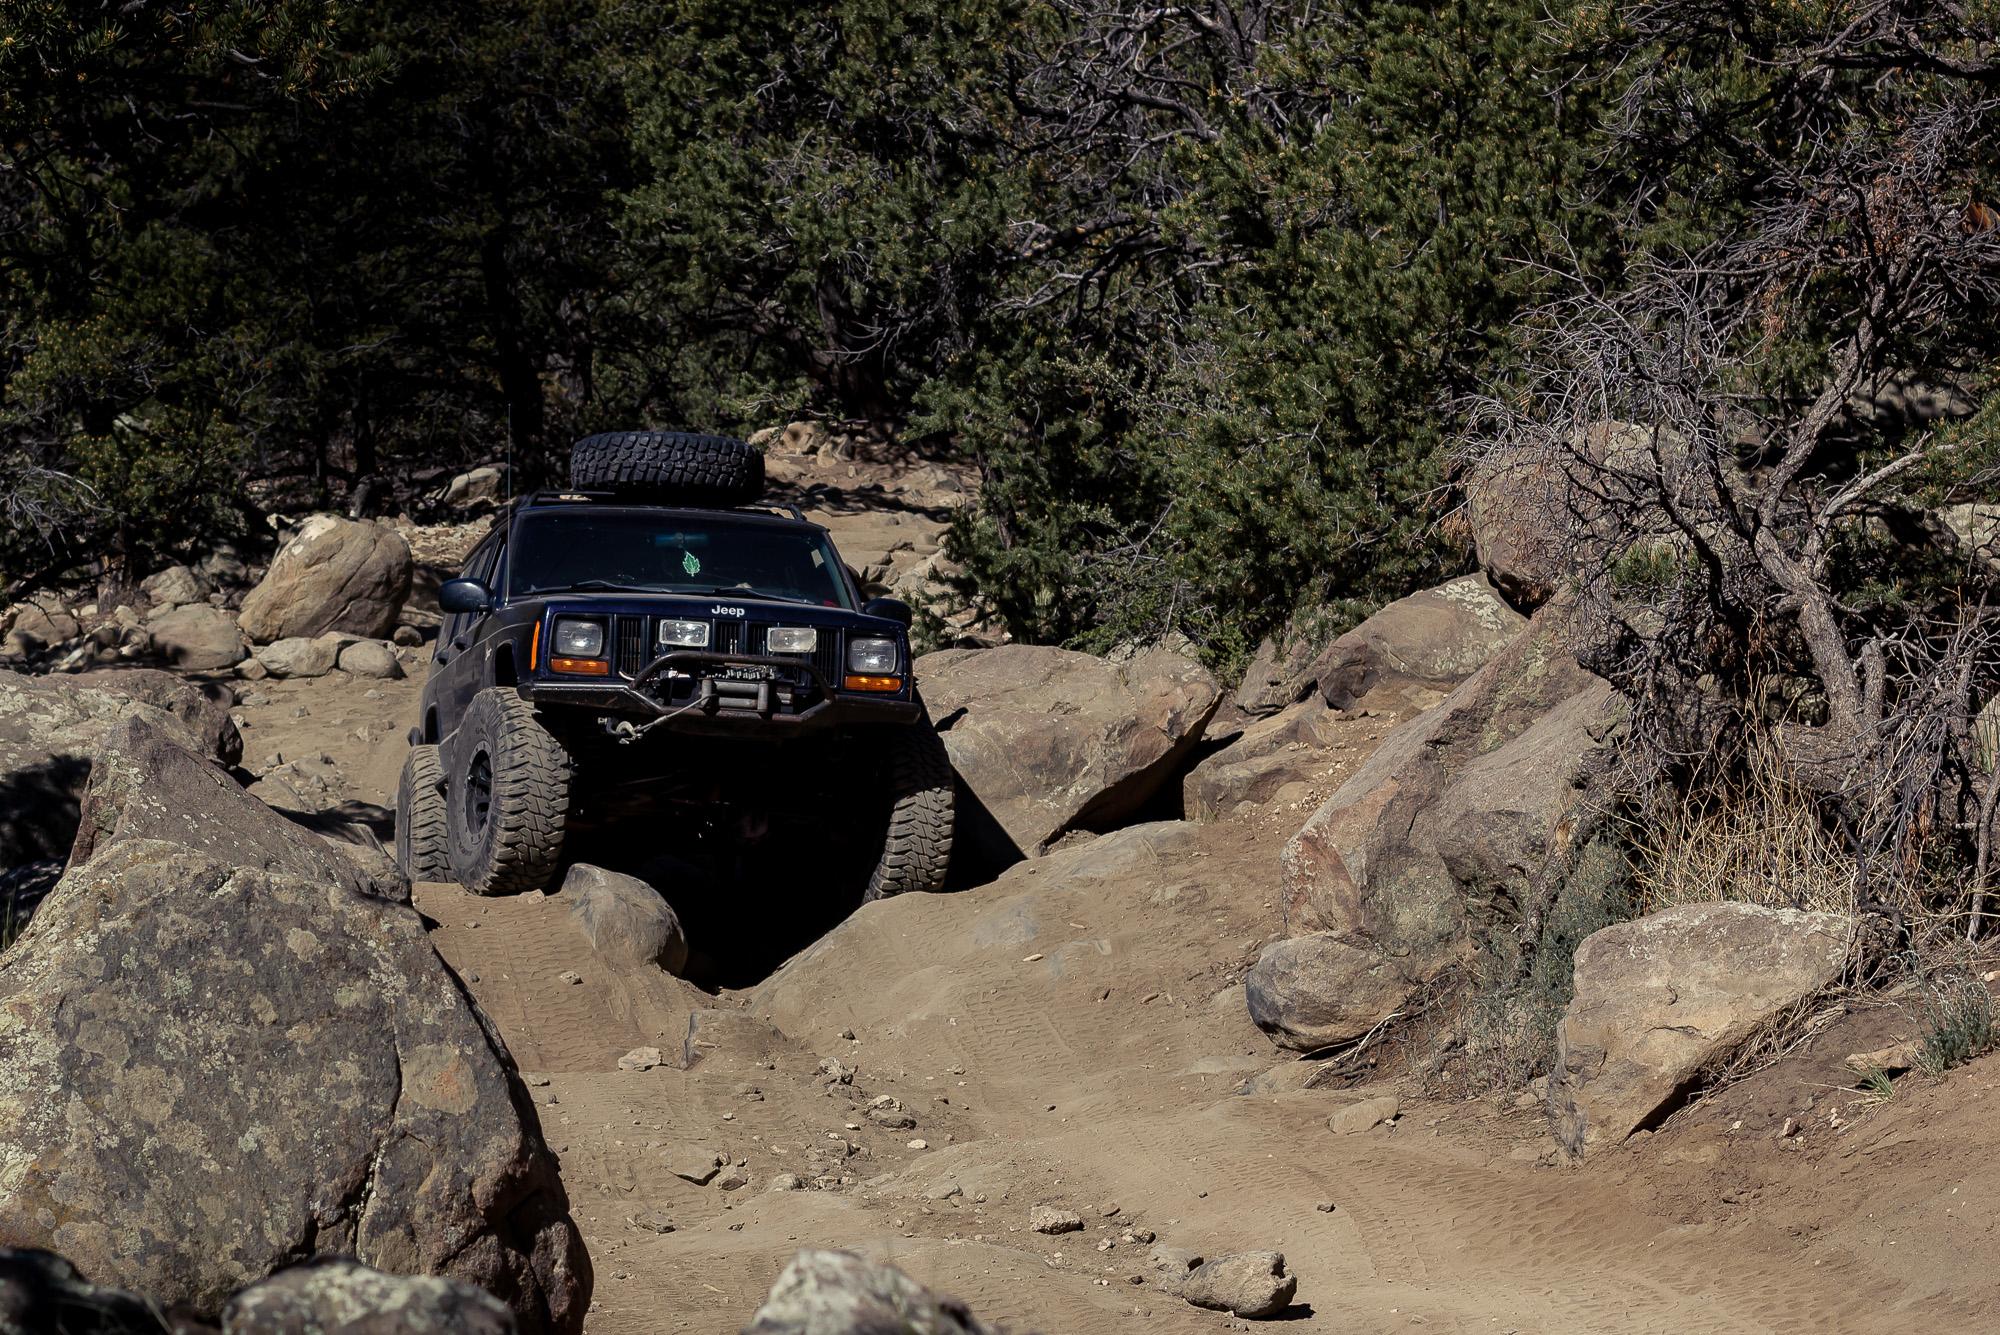 Rock crawling with Jeeps in Colorado